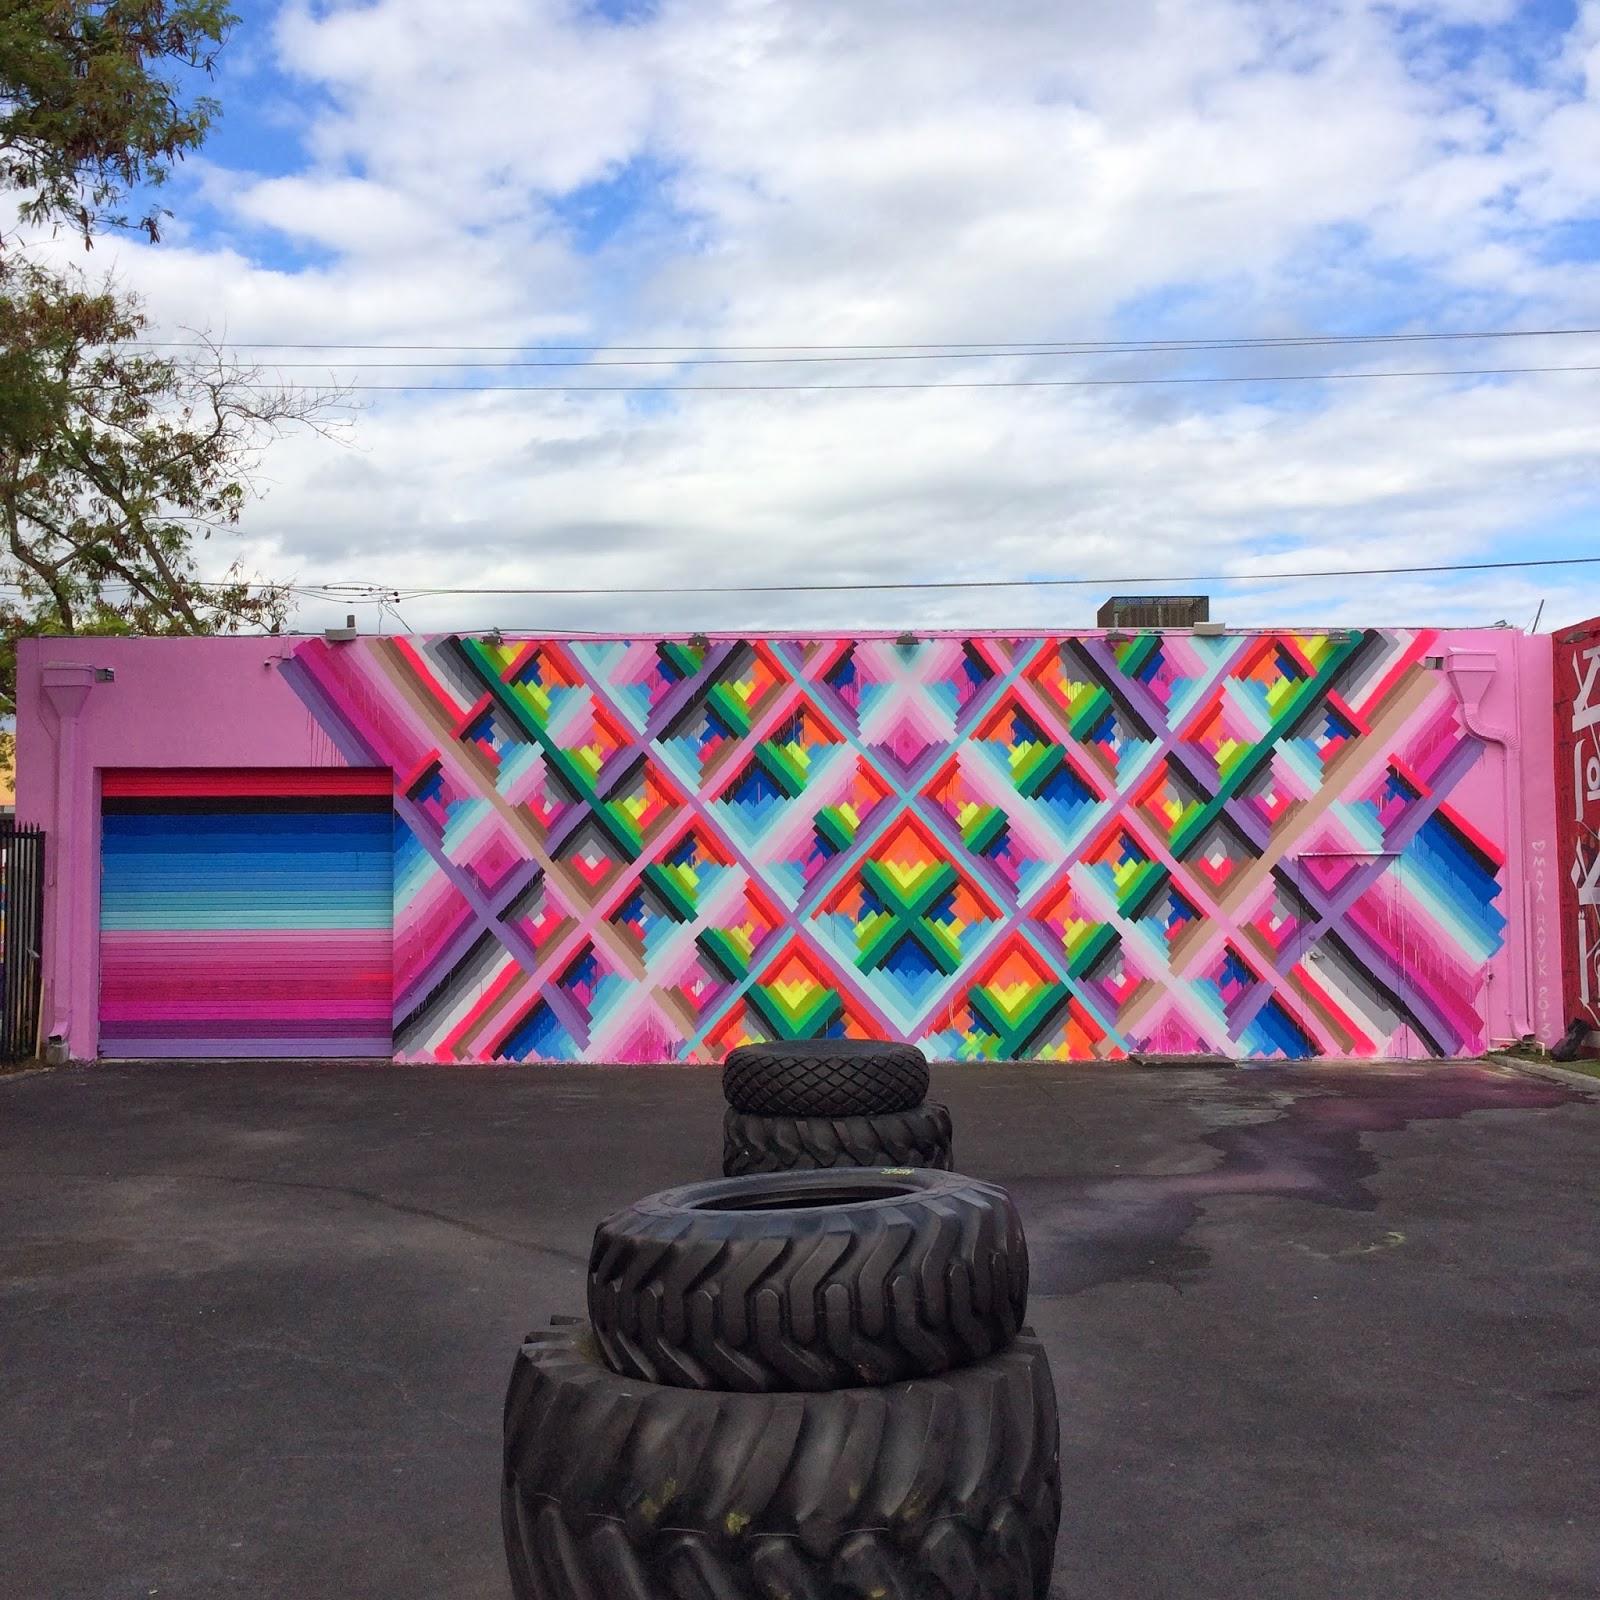 Maya Hayuk New Mural For Art Basel '13 - Wynwood Walls ...